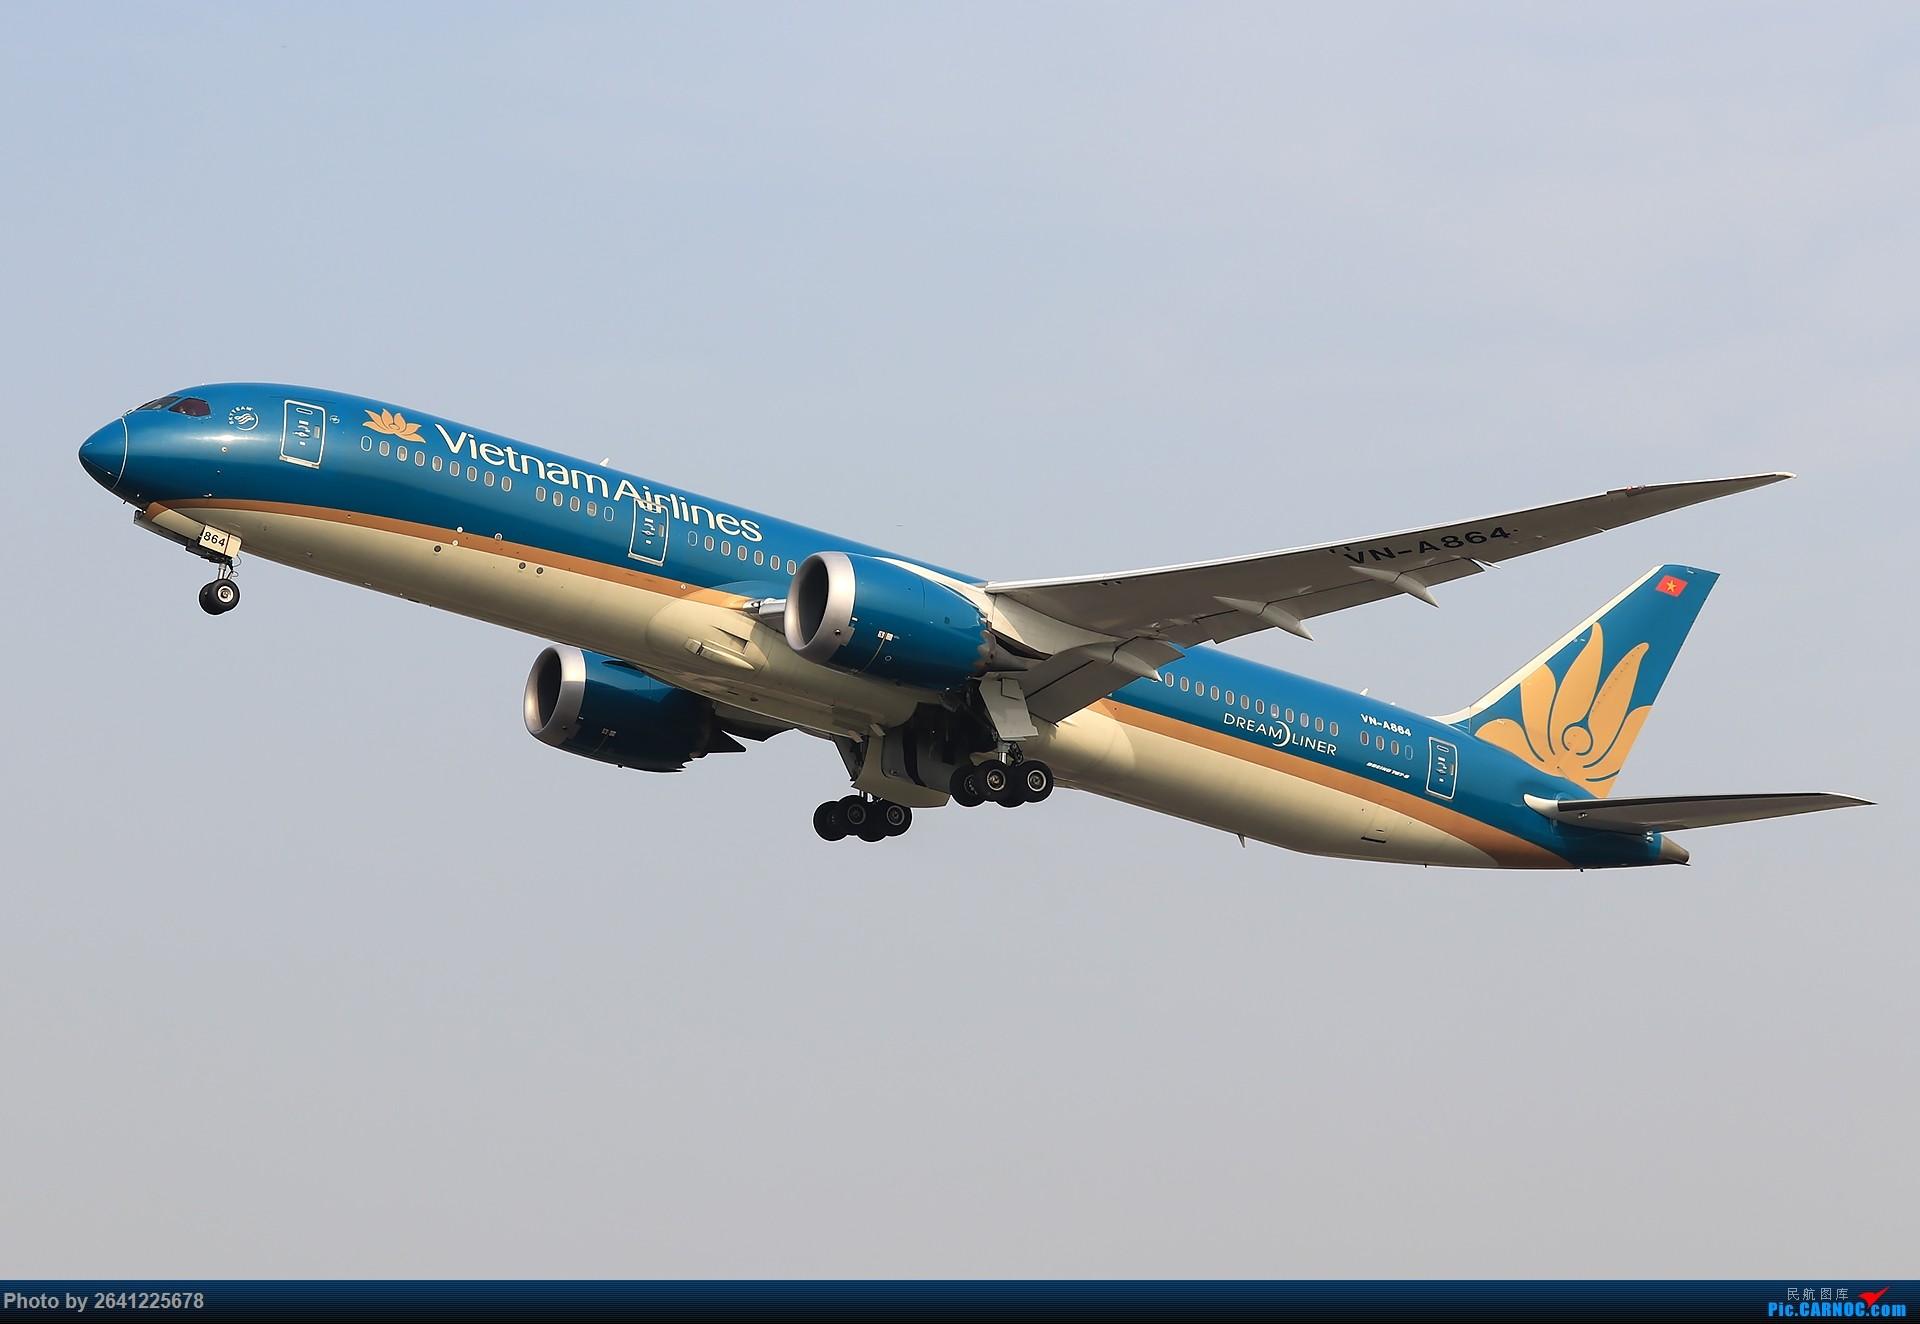 Re:[原创]【TAMRON 156 G2+77D 持续更新中】*****试新机+新镜*****(烂天+地热+渣技术,望大佬多多包涵) BOEING 787-9 VN-A864 中国北京首都国际机场